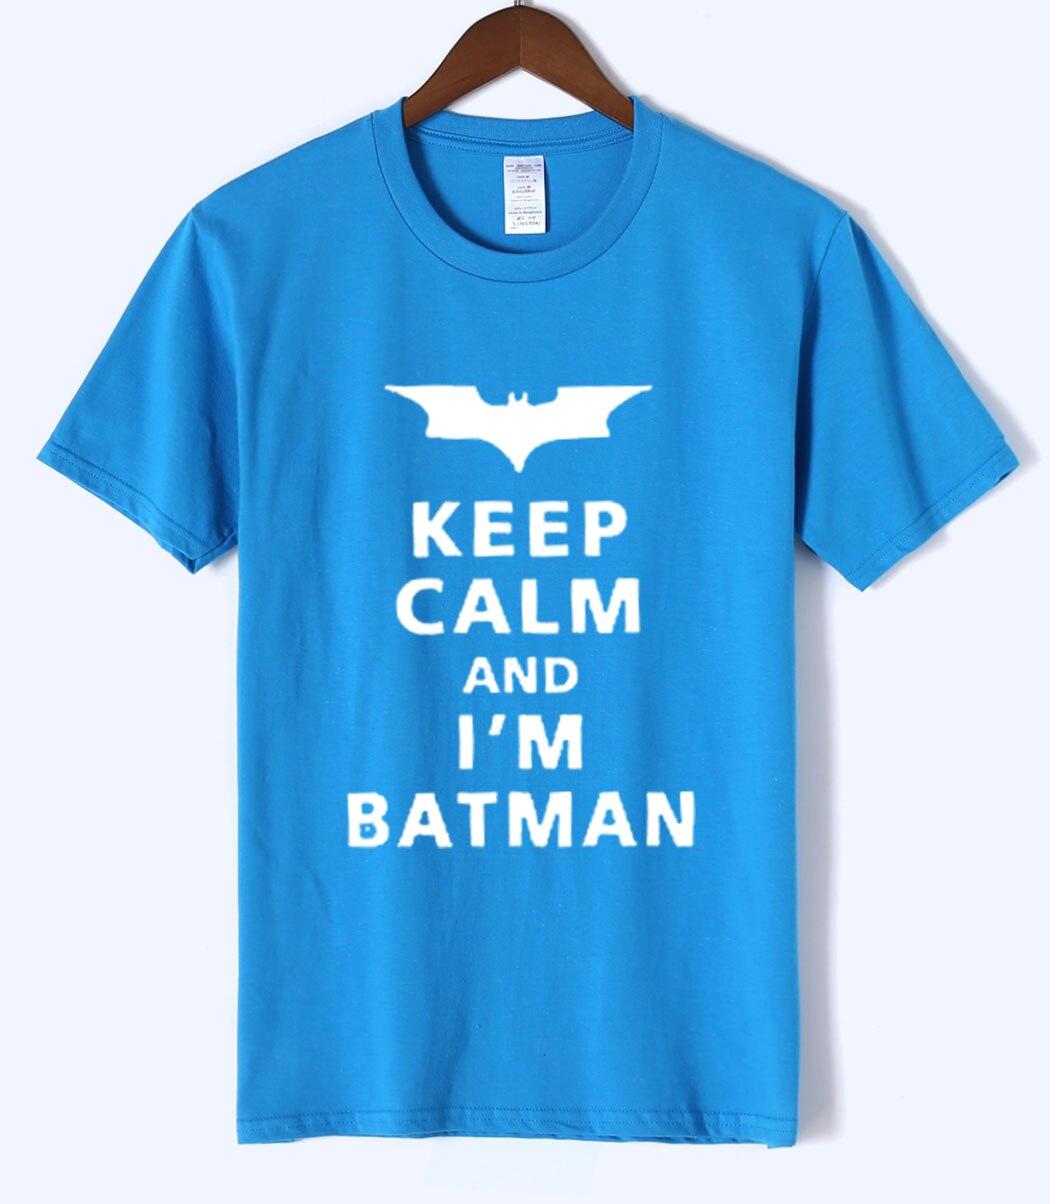 Hot new Garment Funny Cartoon Batman T Shirts Men Keep Calm I Am Batman 100% Cotton High Quality Tshirts